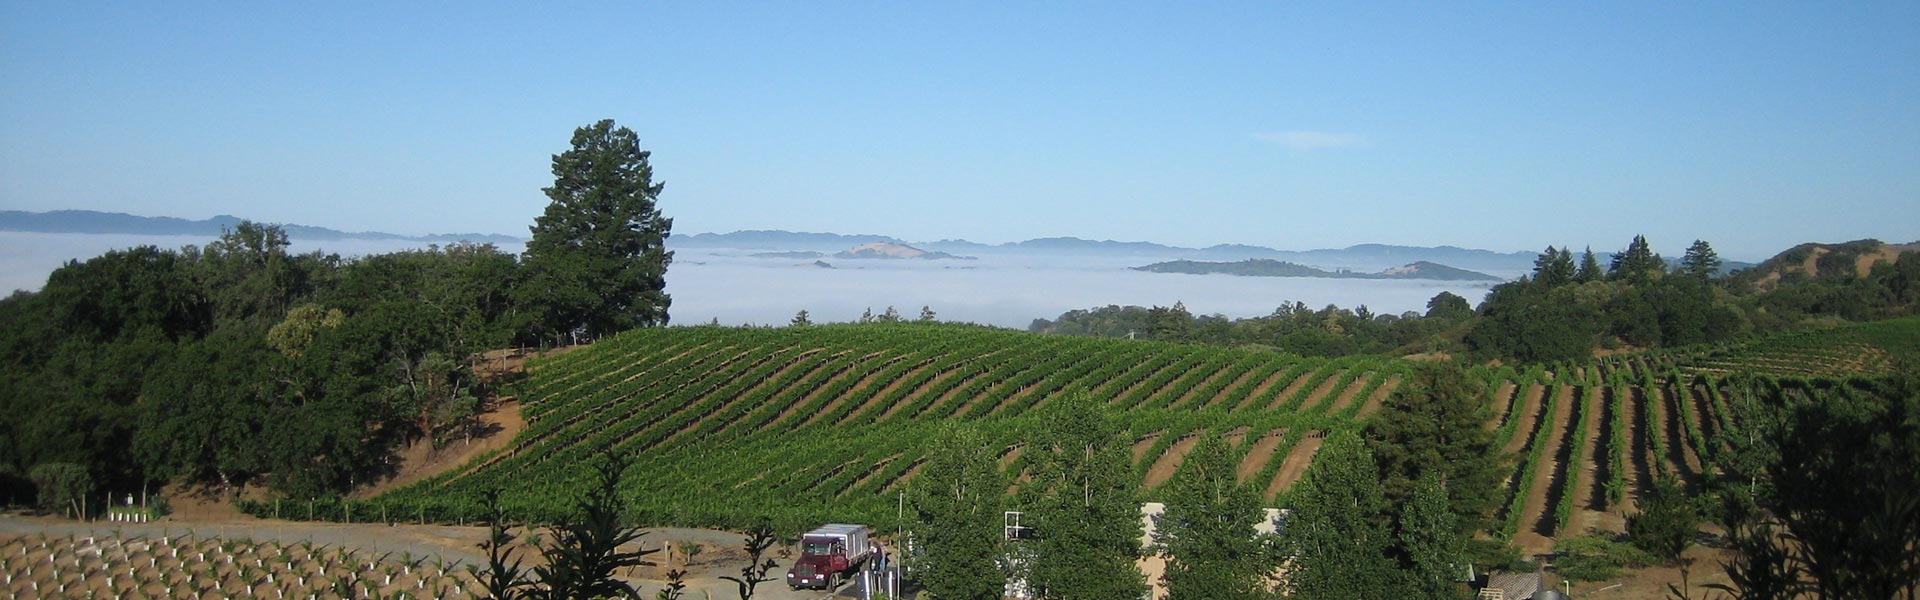 Sky Pine Vineyards and Bobdog Wine